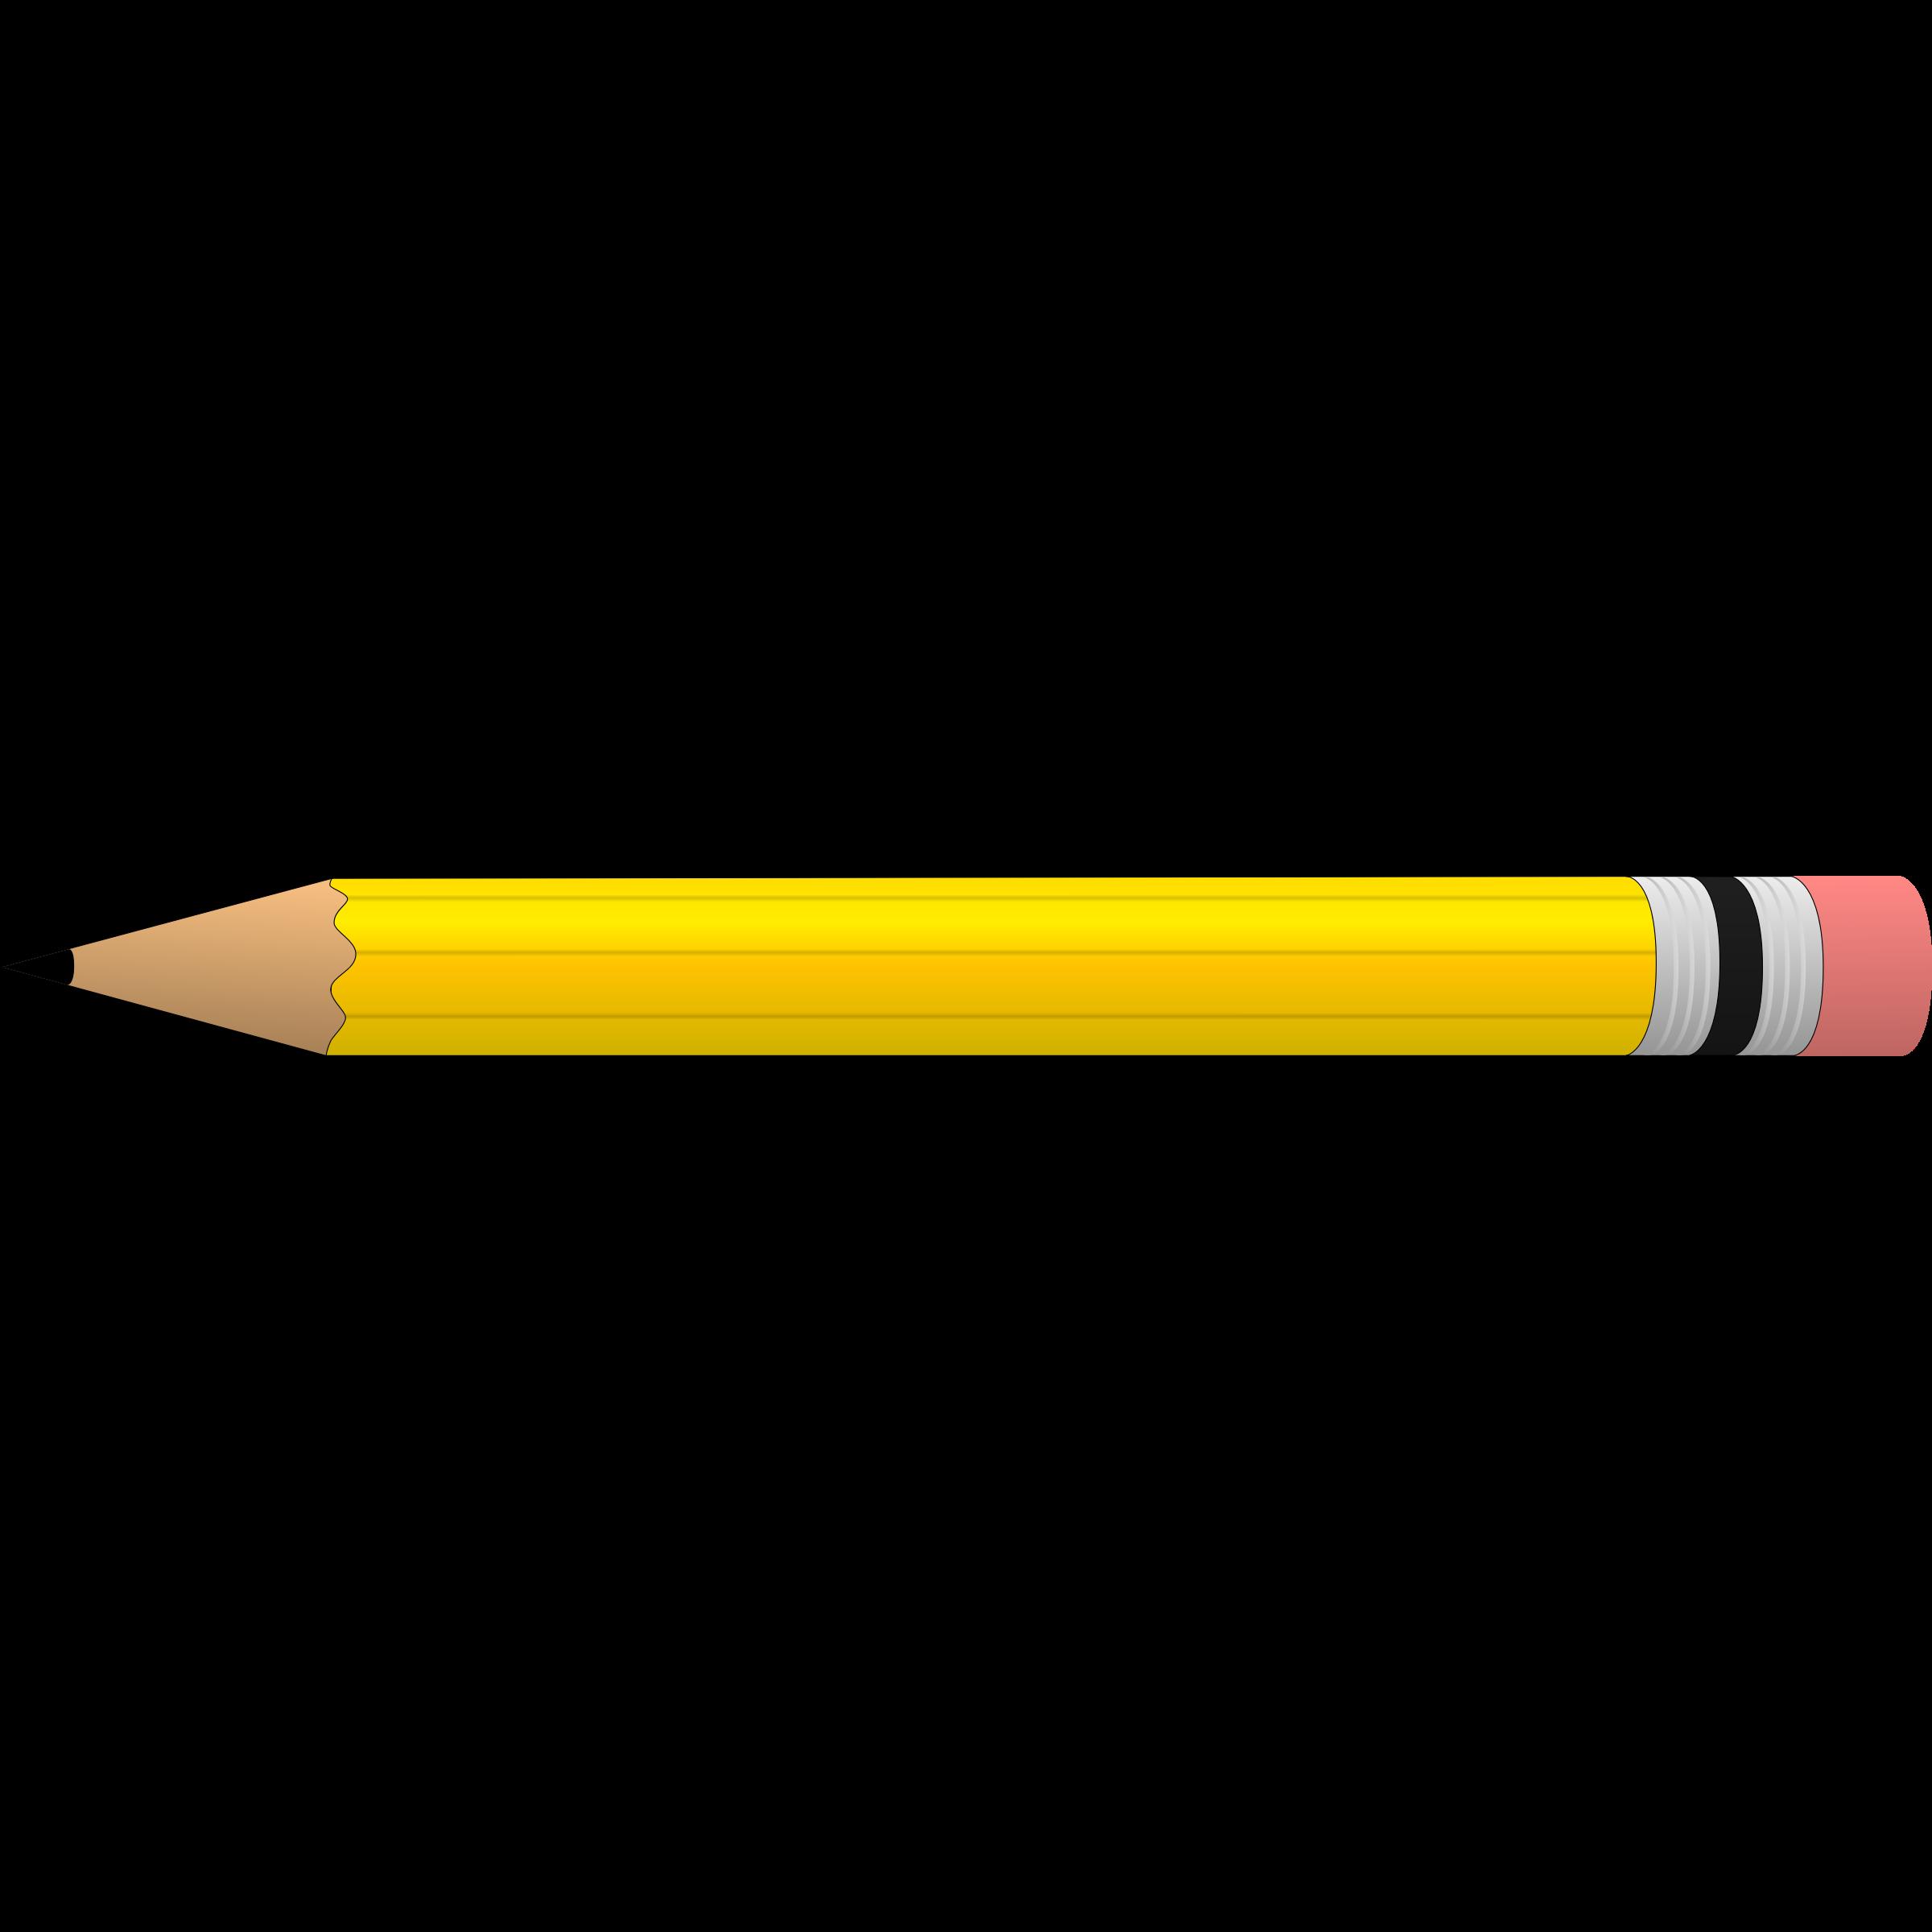 Pencil clipart - Clipground